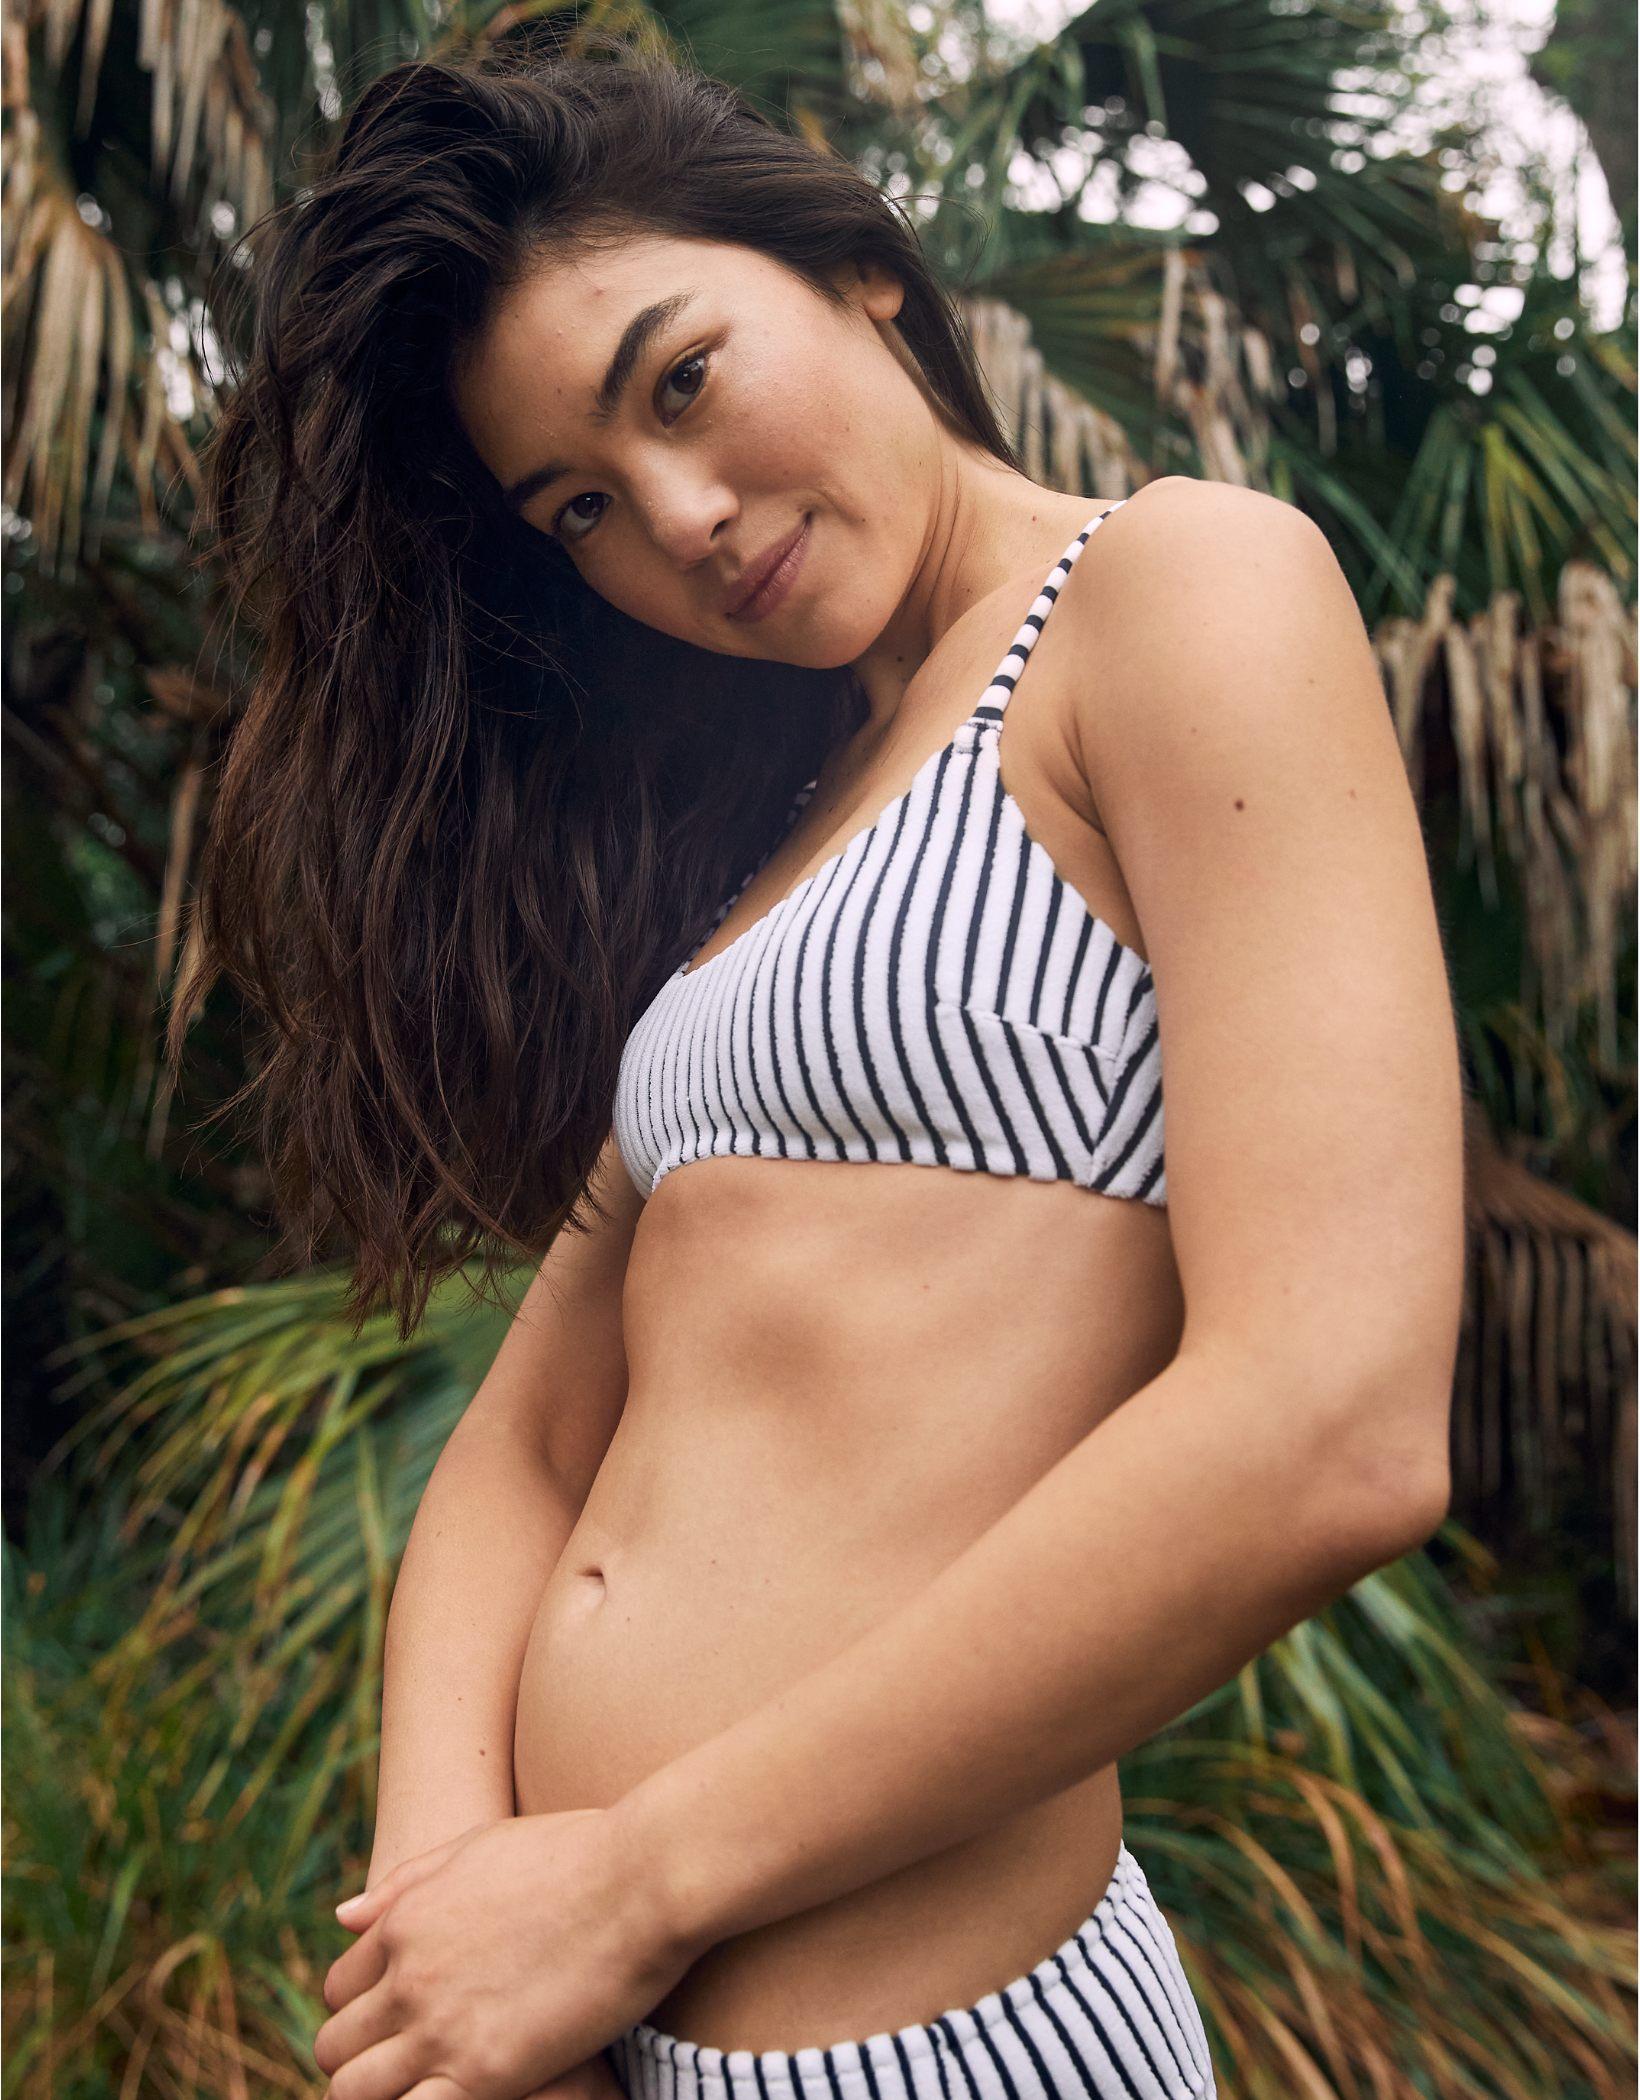 Aerie Terry Striped Scoop Bikini Top